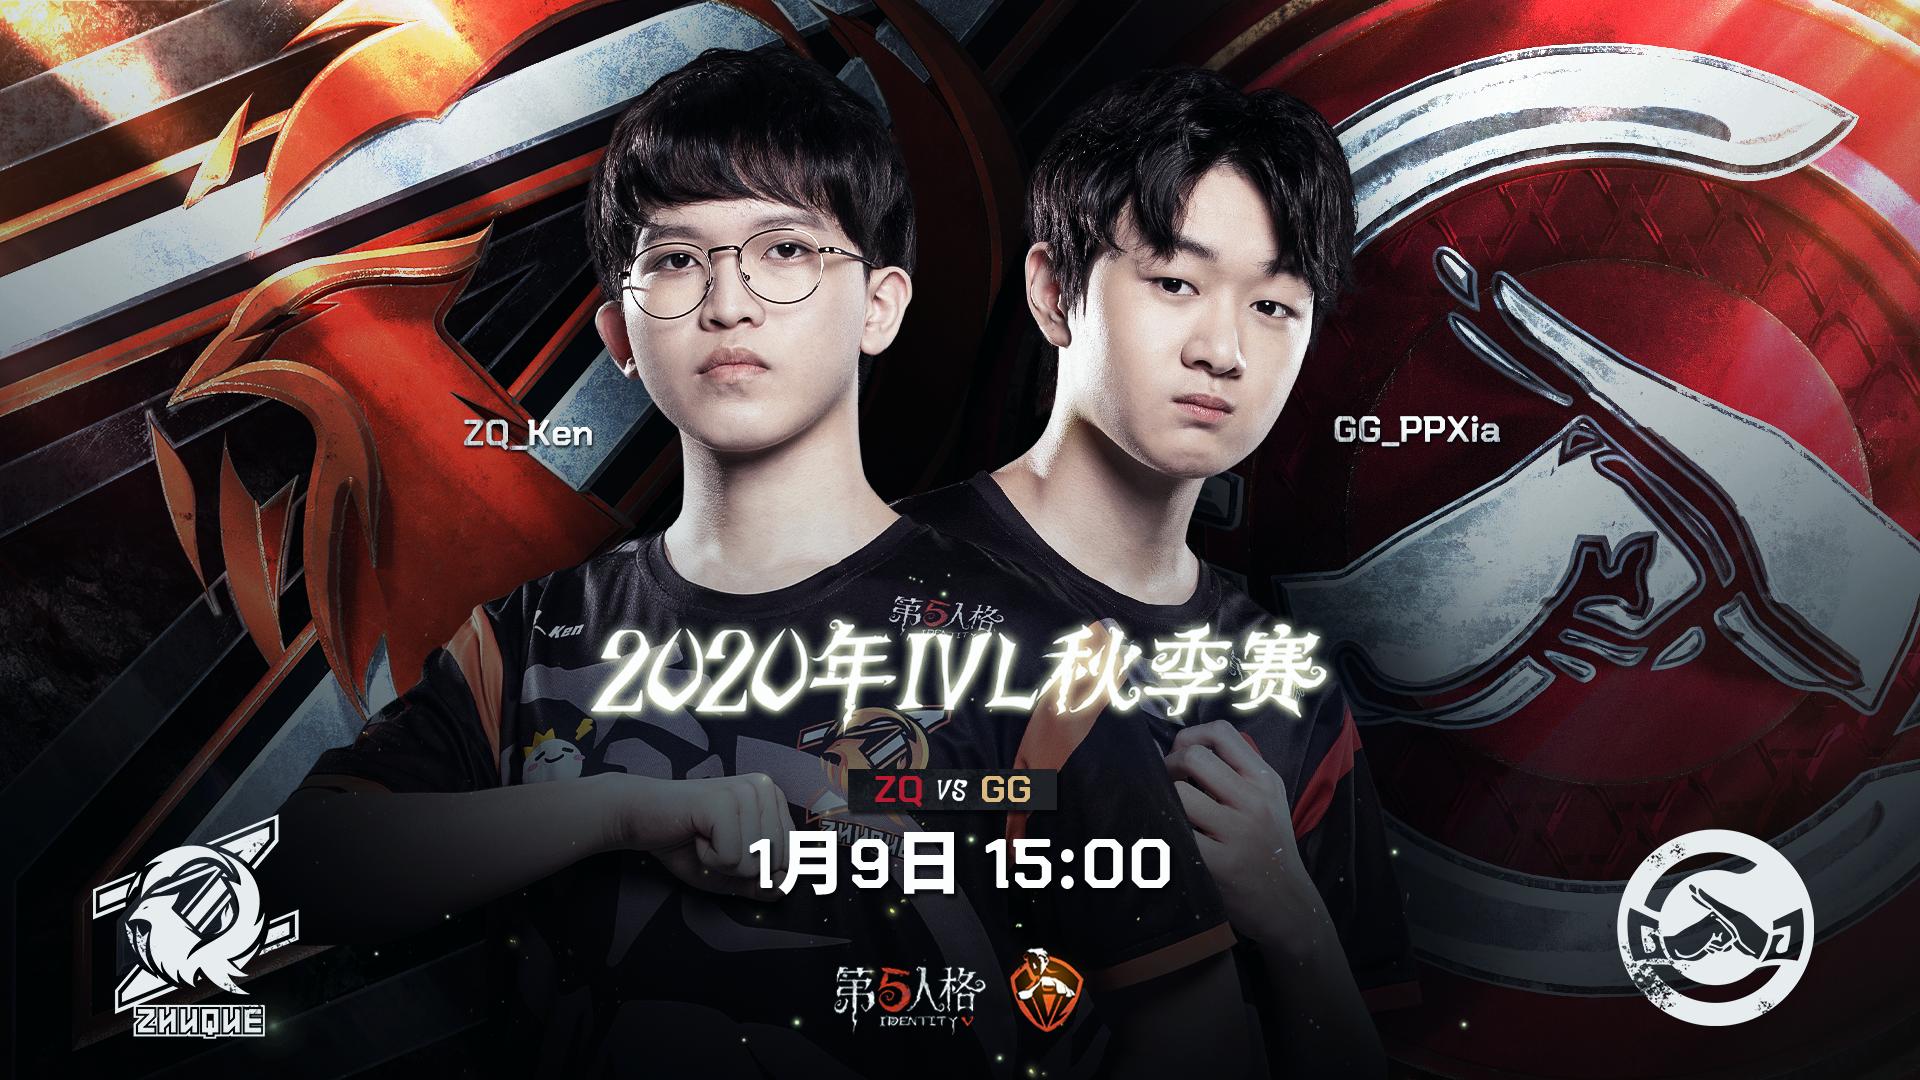 【2020IVL】秋季赛总决赛Day2录像 ZQ vs GG